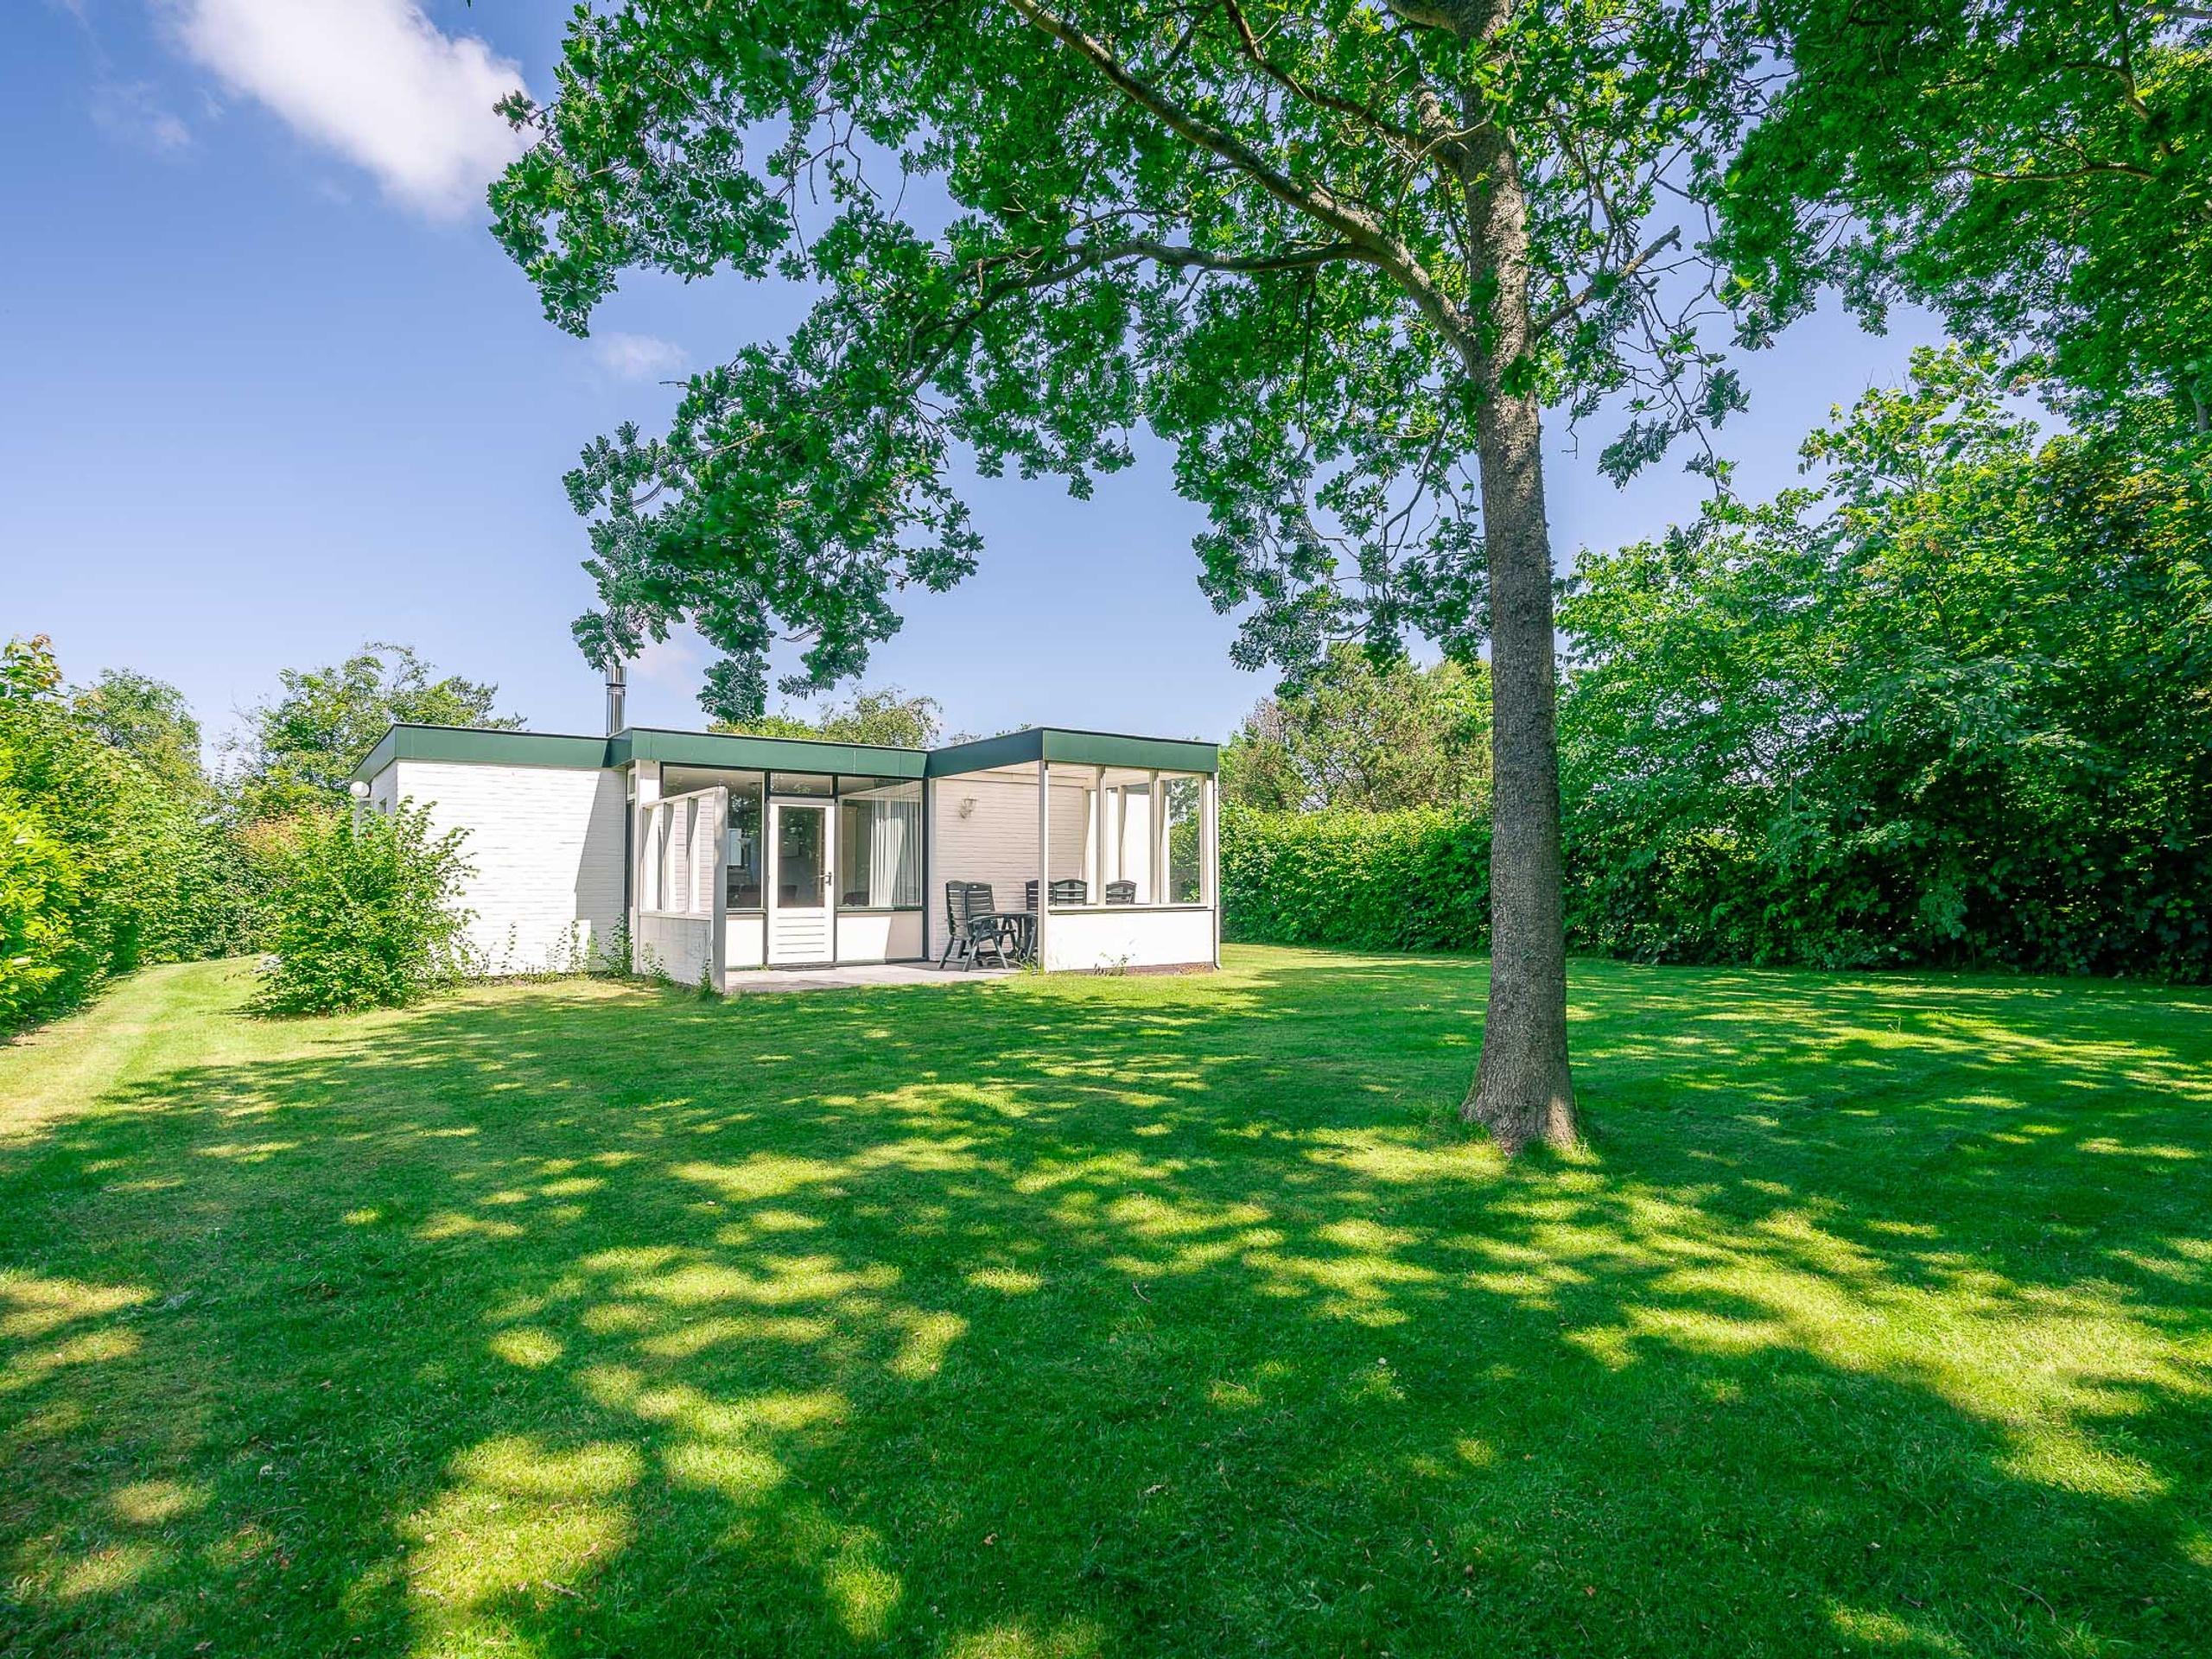 Detached bungalow in De Parel park on the edge of the forest